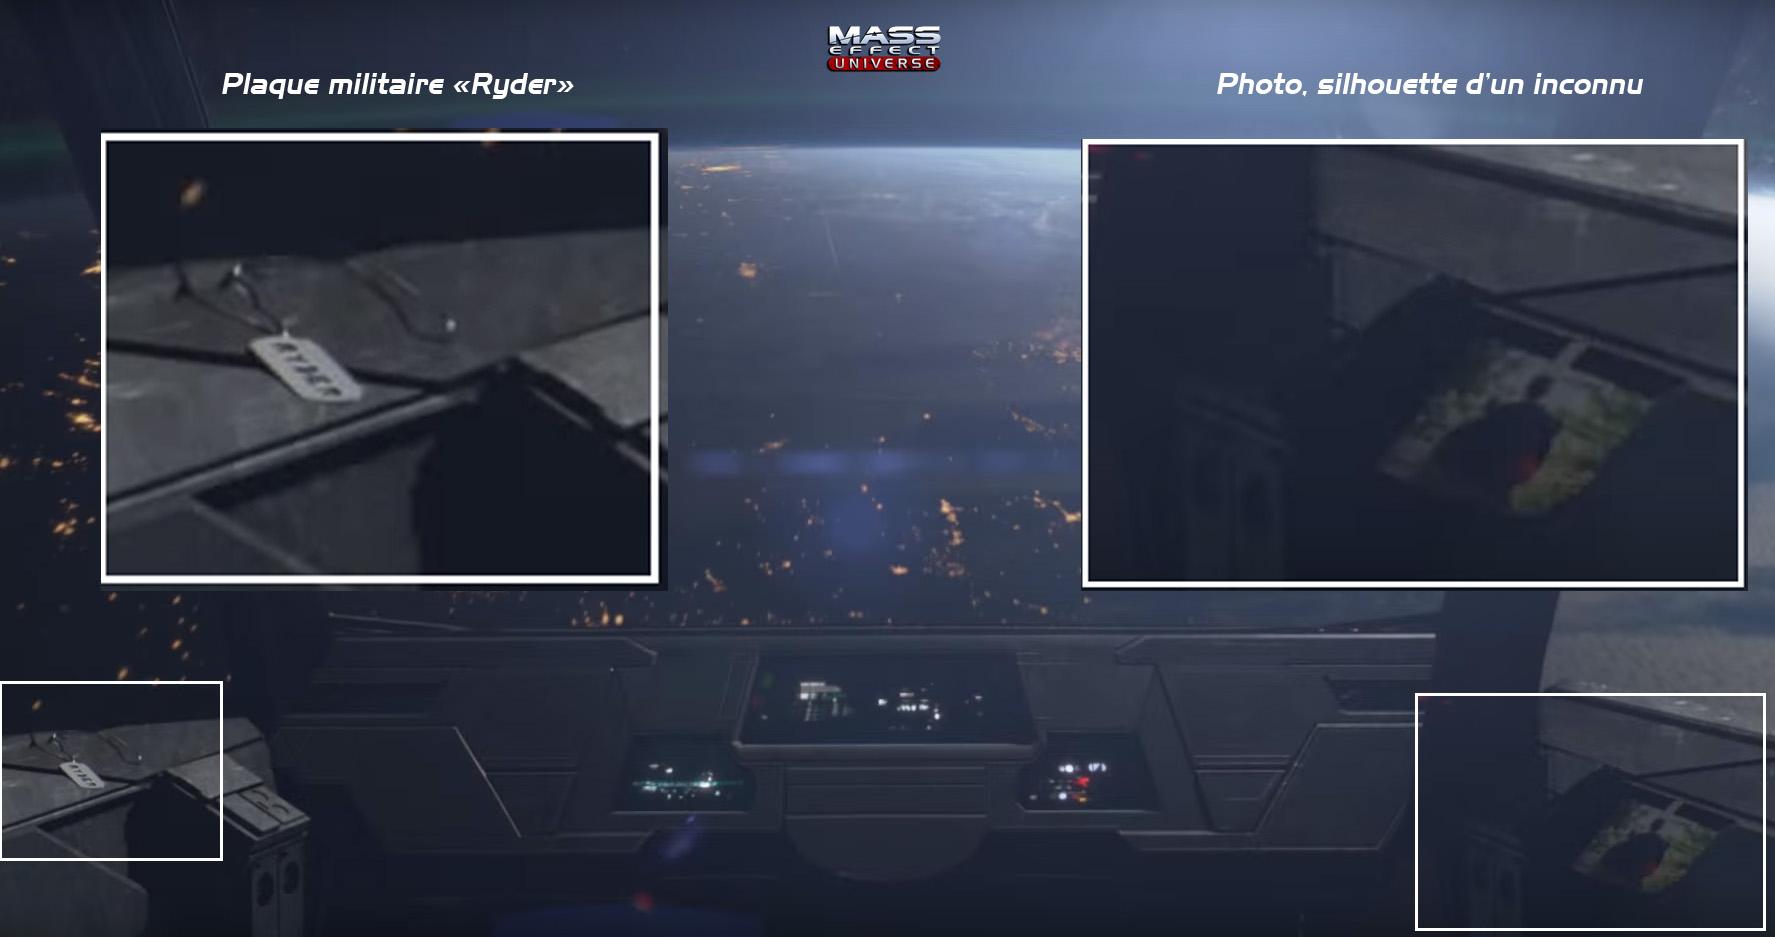 Ryder, Trailer de Mass Effect Andromeda